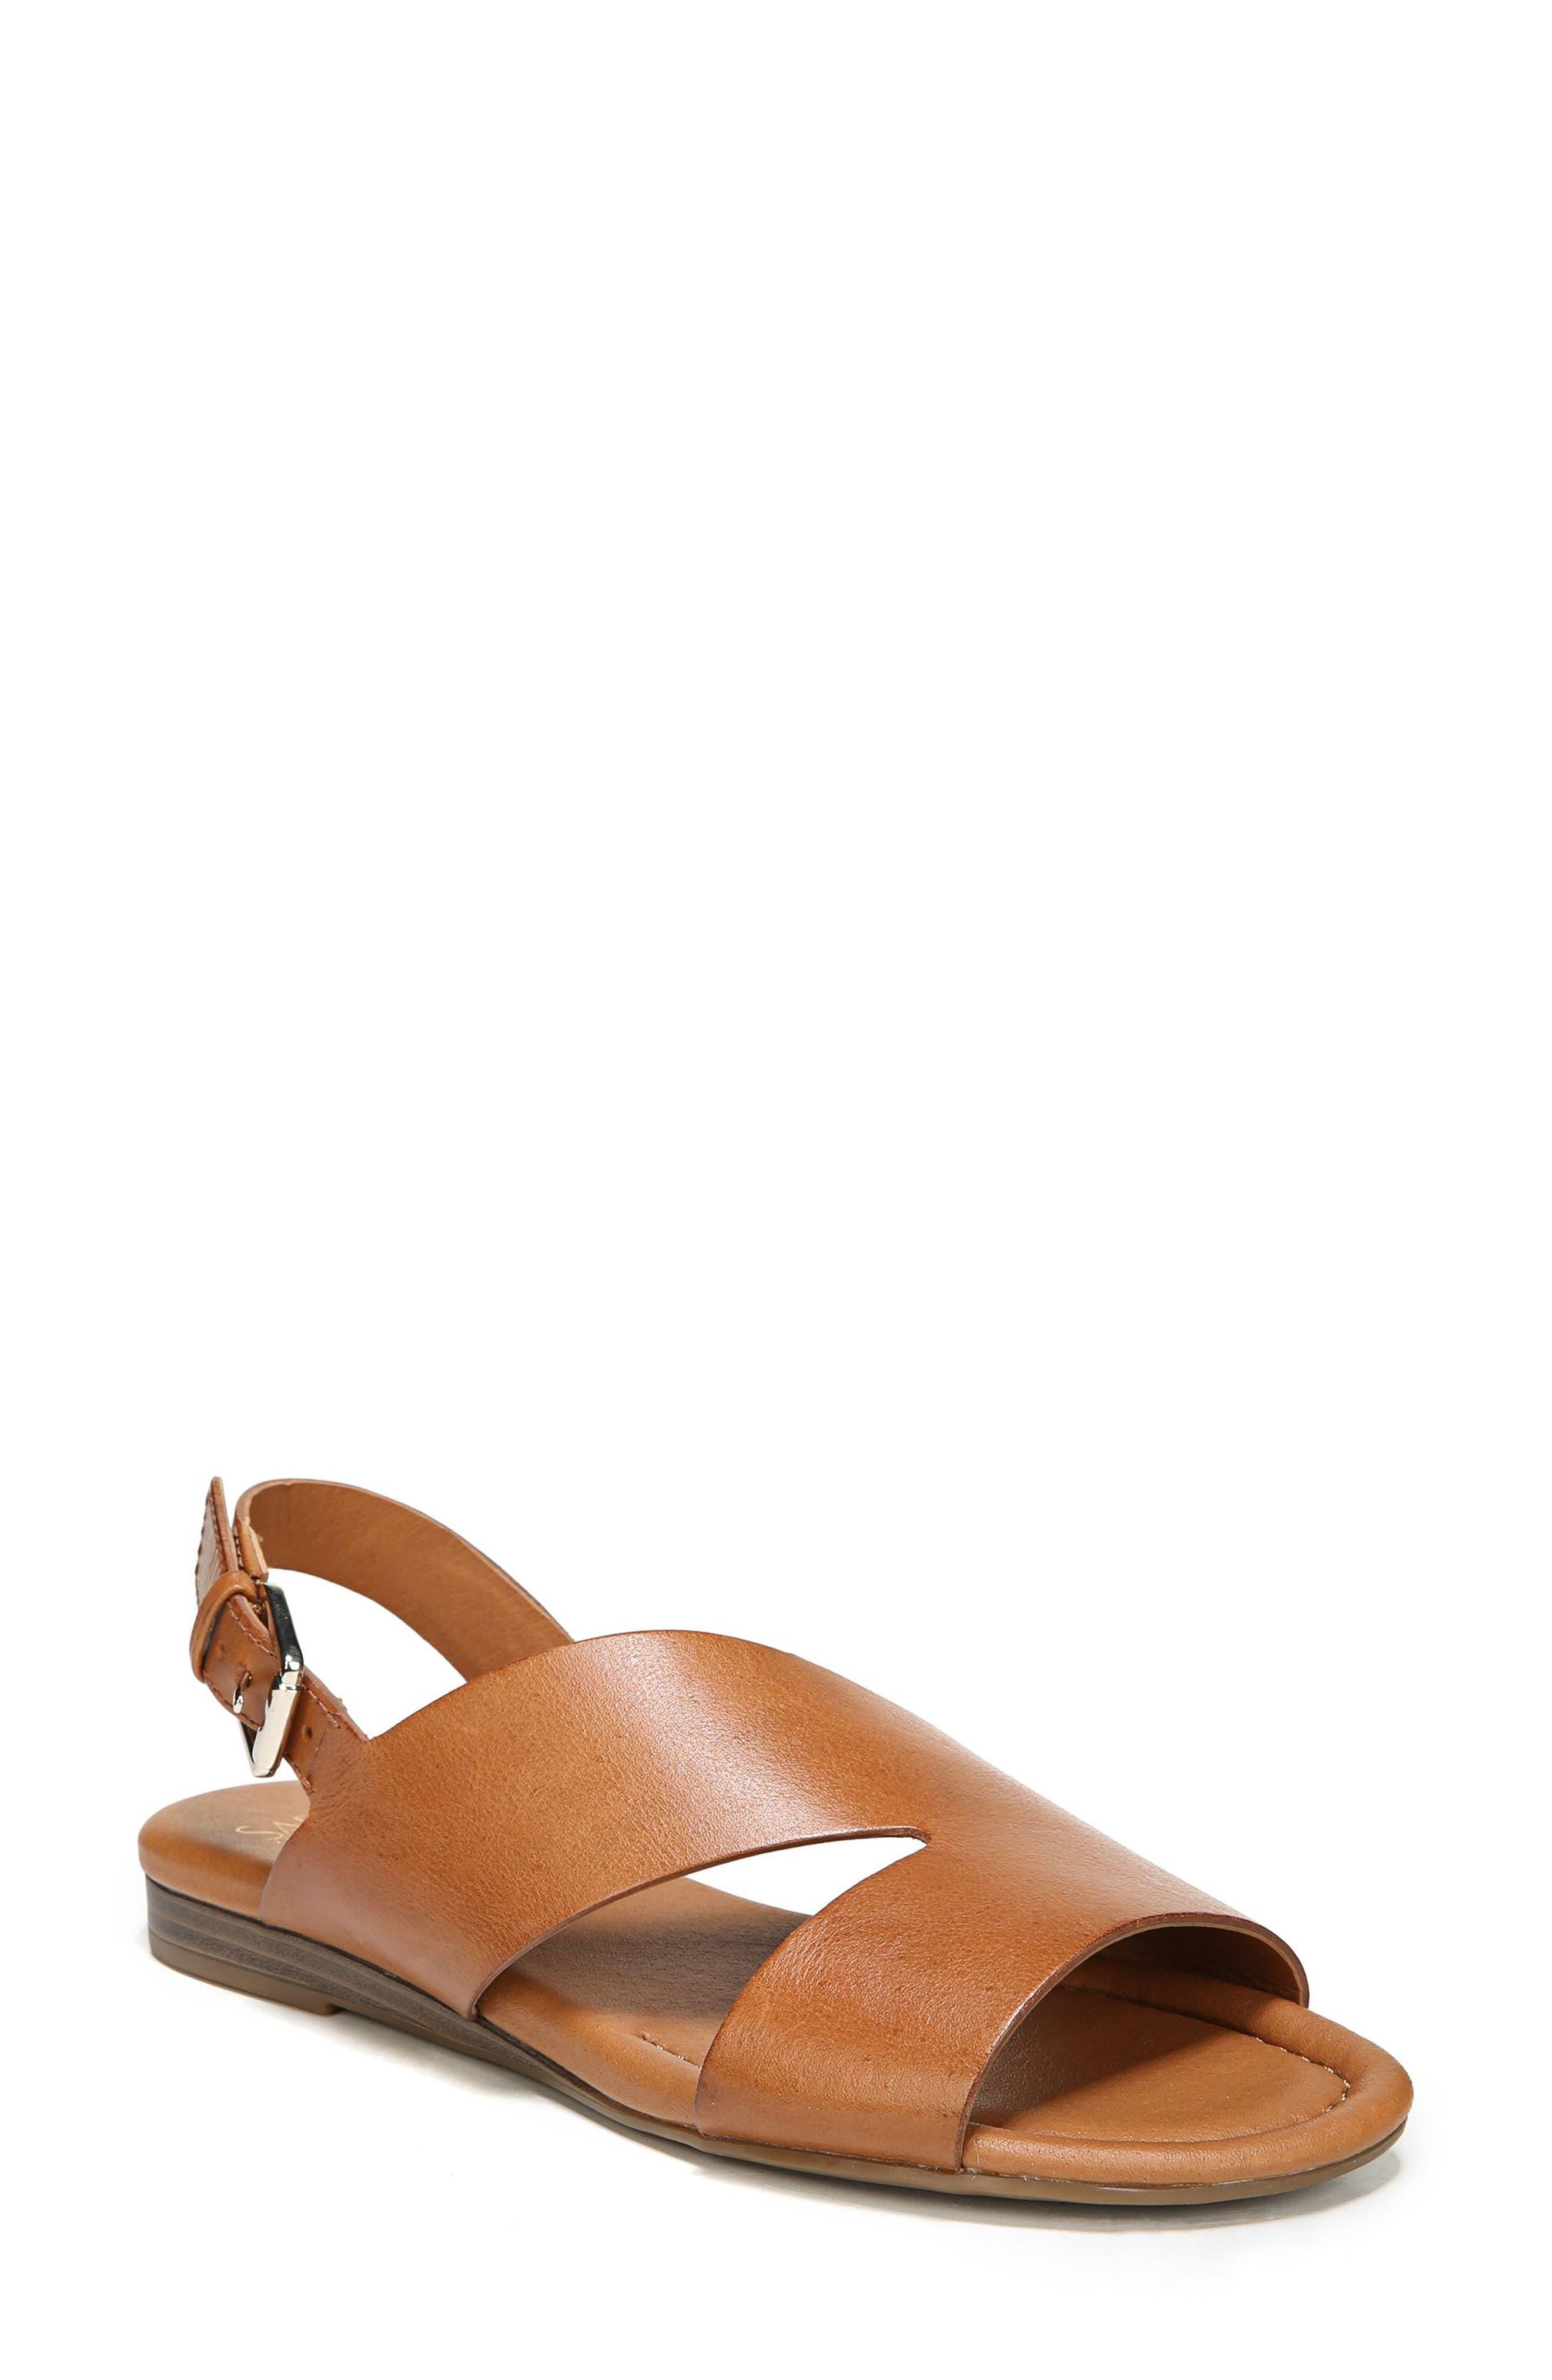 Garza Slingback Sandal,                         Main,                         color, Tan Leather